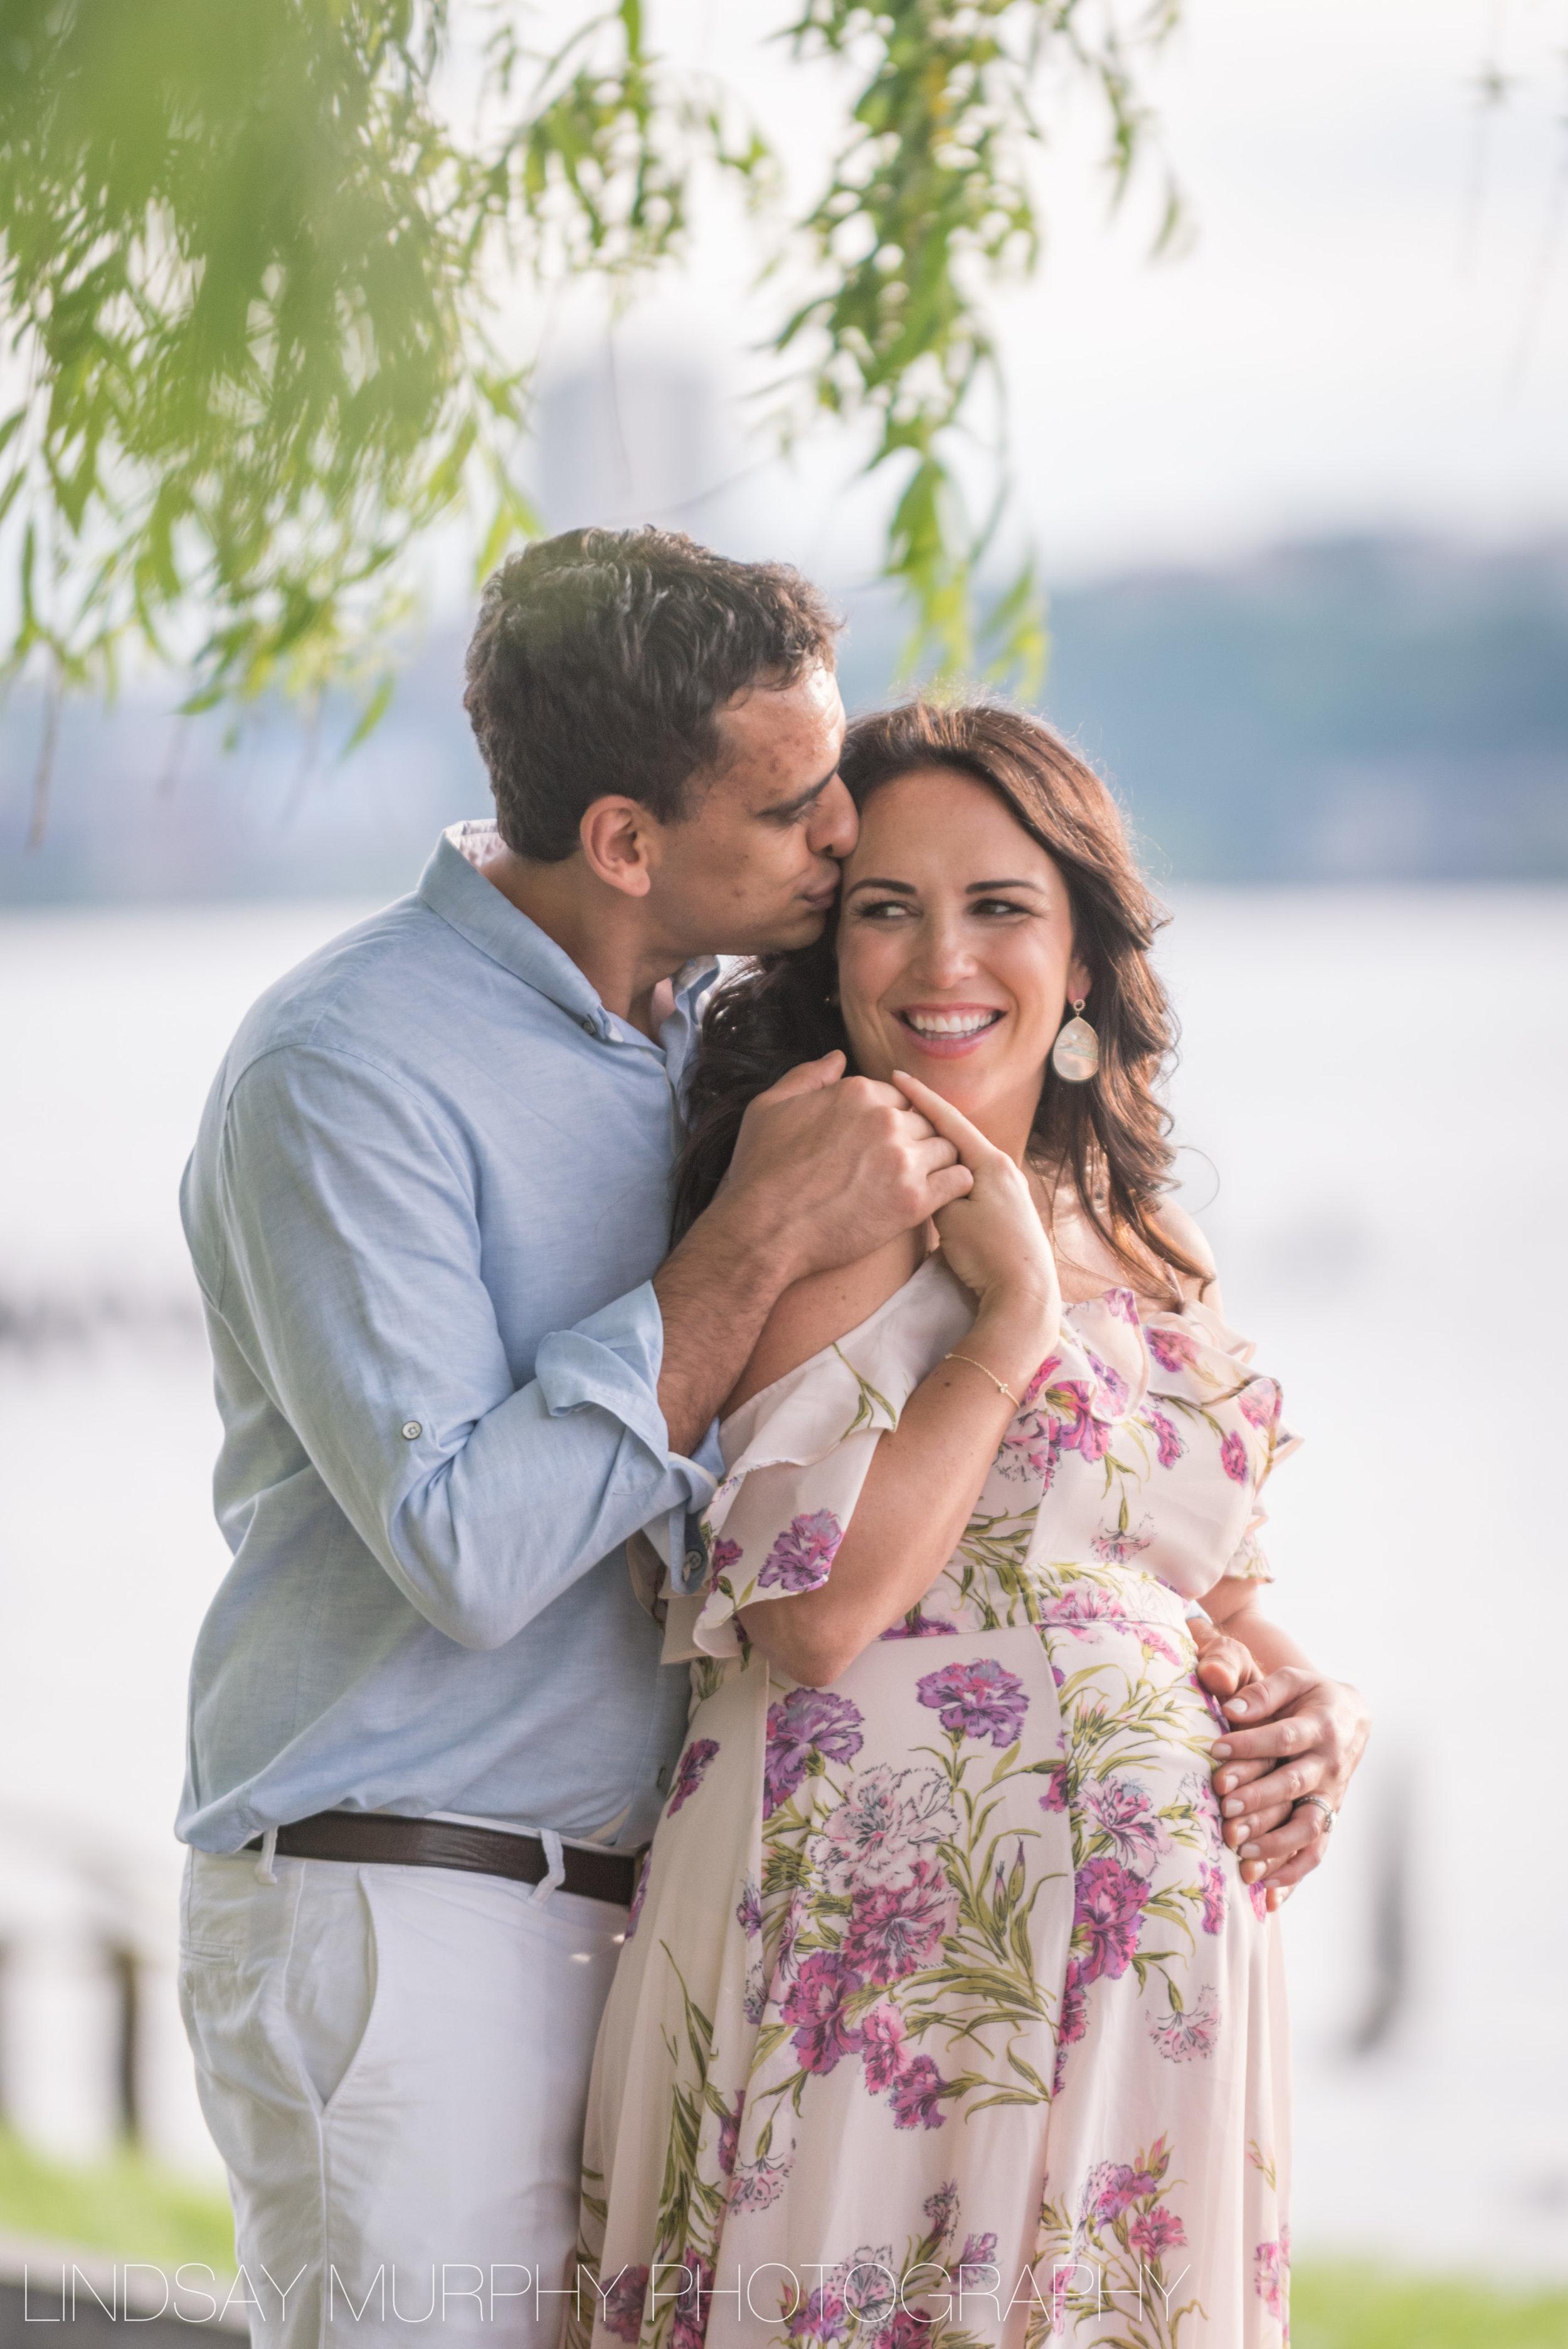 new_england_maternity_photographer-30.jpg